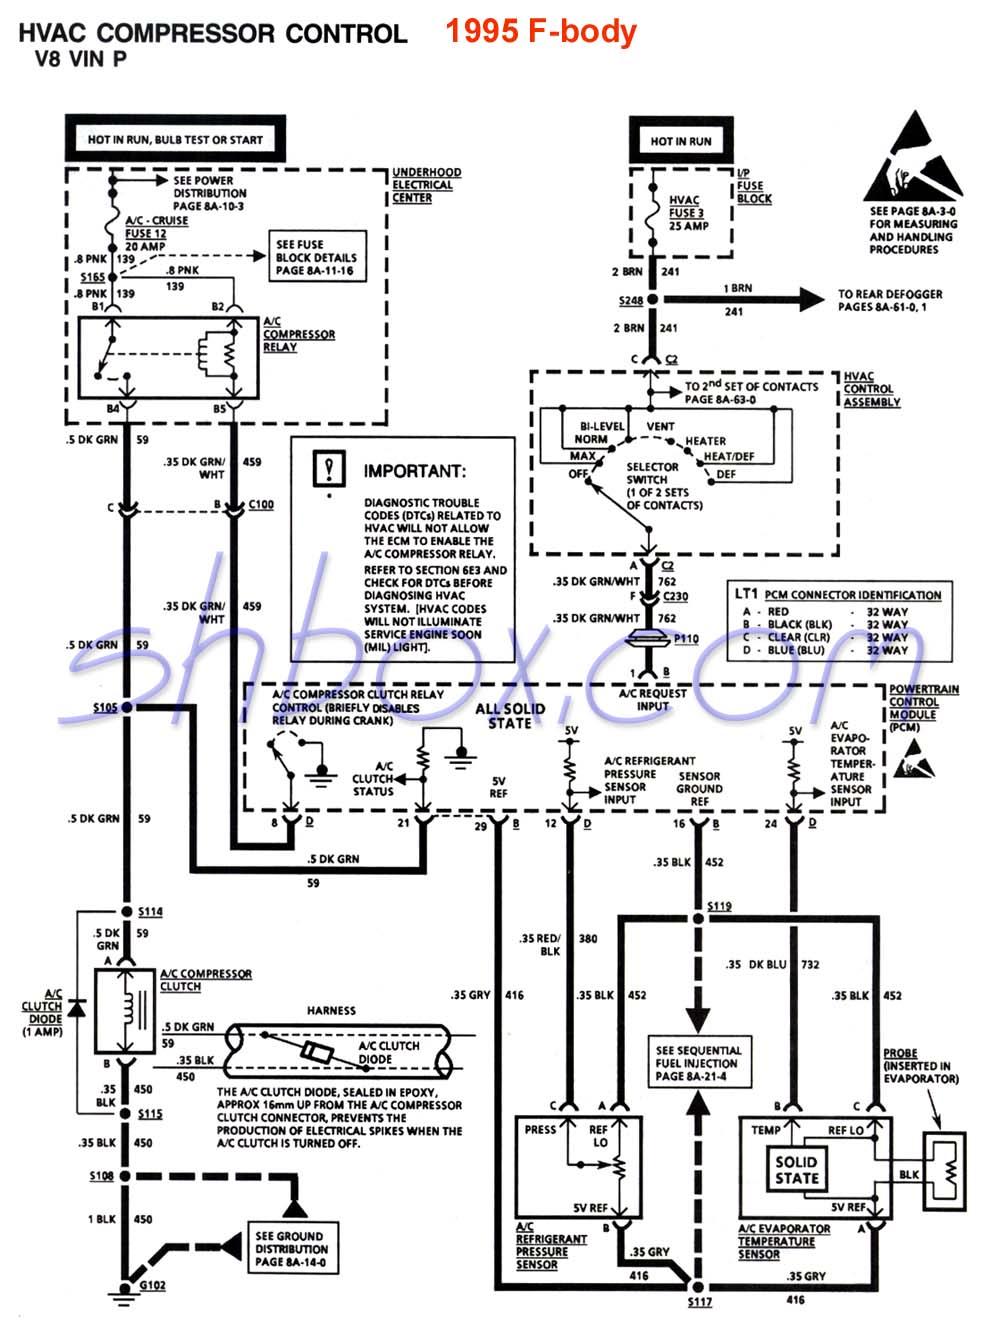 2005 chevy equinox suspension diagram multiple gfci outlet wiring a/c compressor question ... - camaroz28.com message board